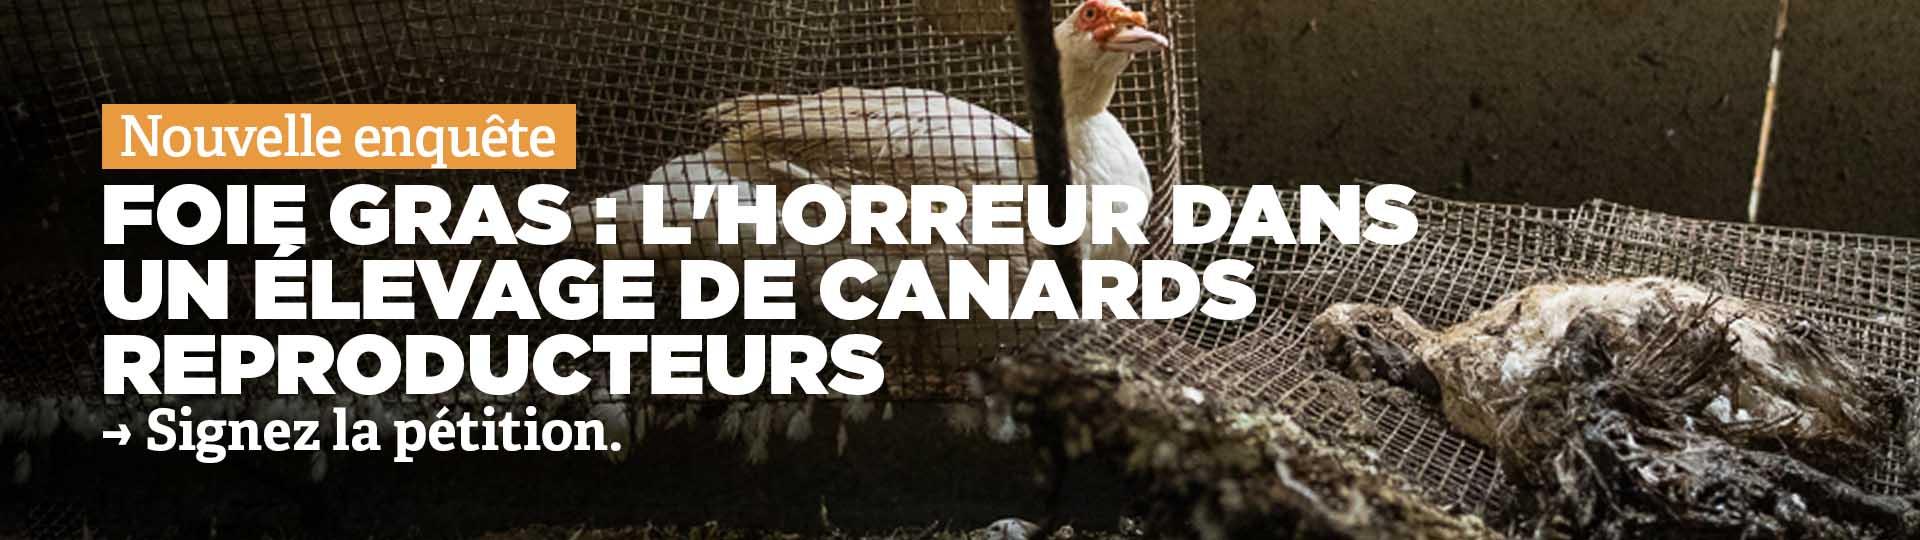 Canards reproducteurs